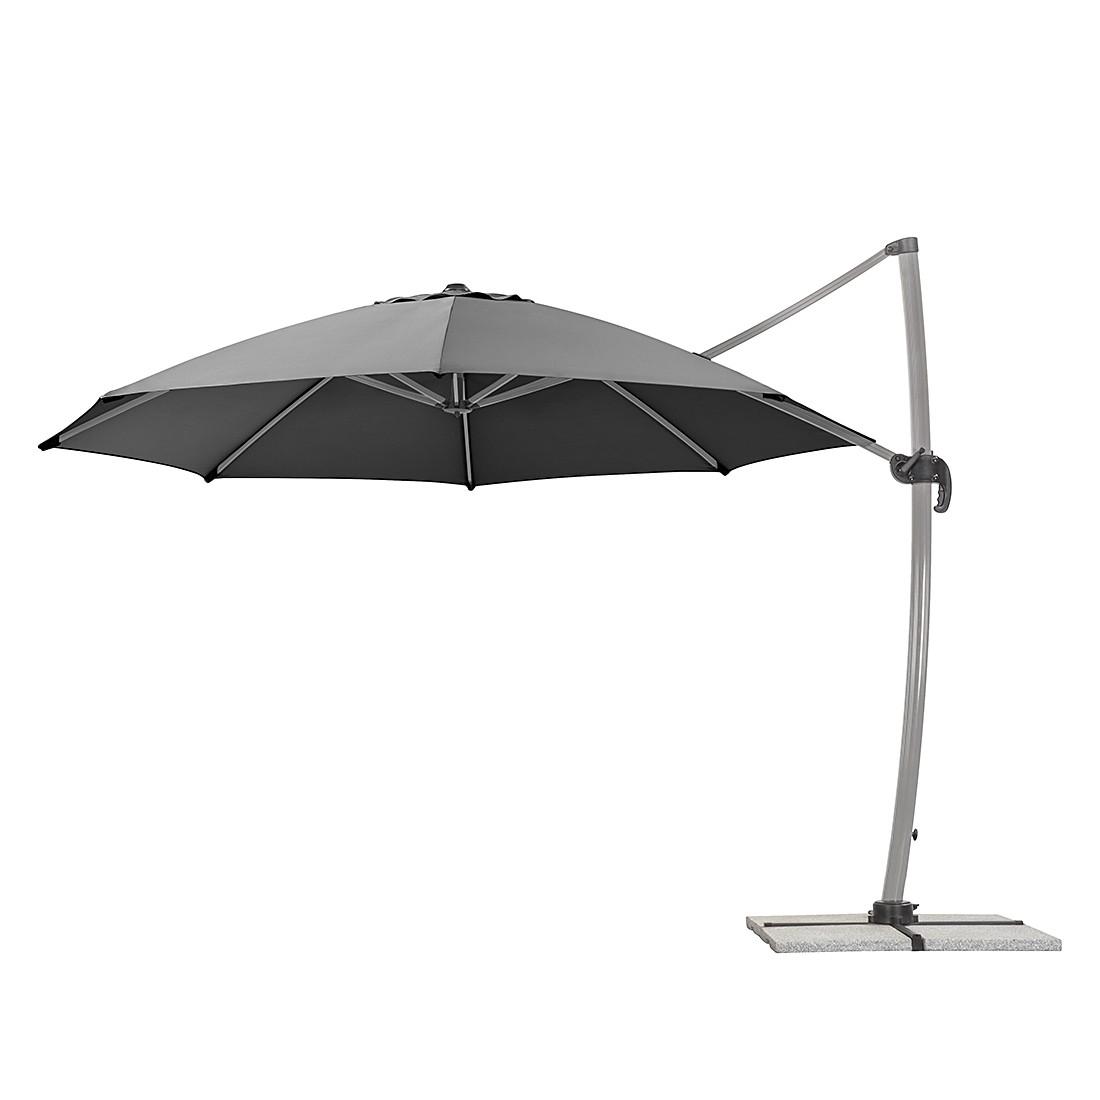 ampelschirm rhodos aluminium polyester anthrazit schneider schirme g nstig. Black Bedroom Furniture Sets. Home Design Ideas